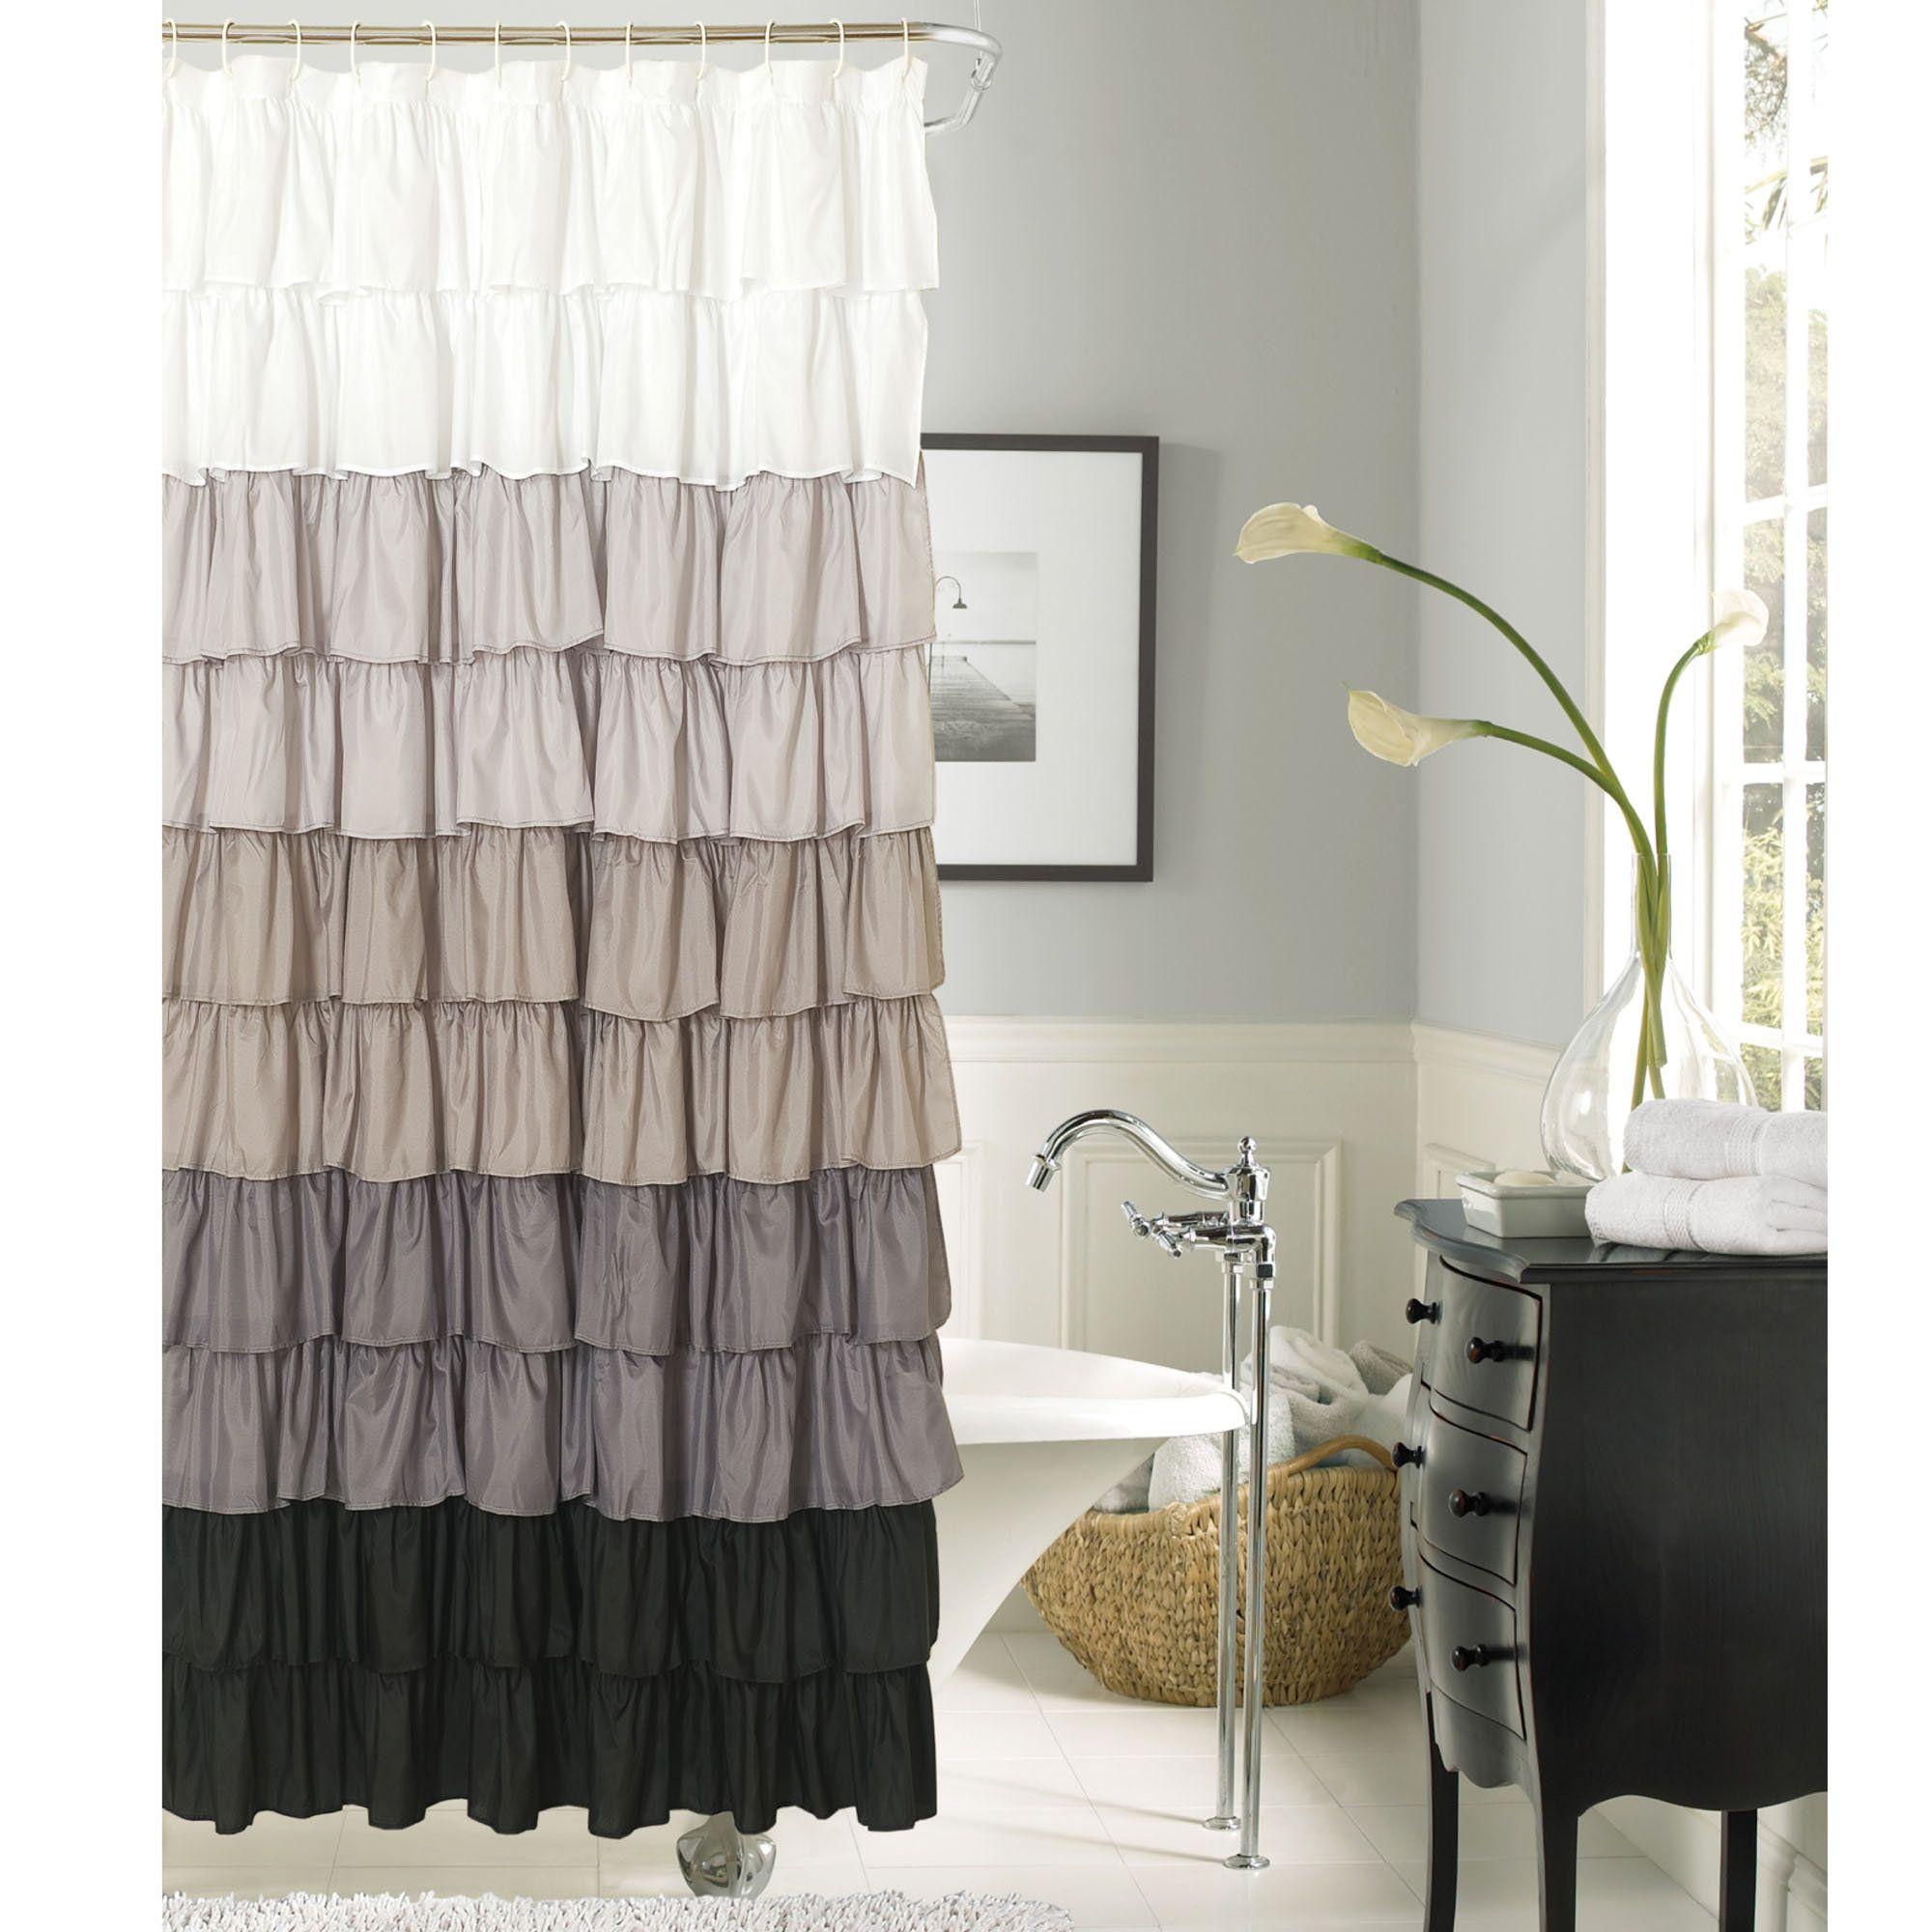 29 99 Flamenco Ruffled Shower Curtain Charcoal 72 X 72 Ruffle Shower Curtains Purple Shower Curtain Ruffle Curtains